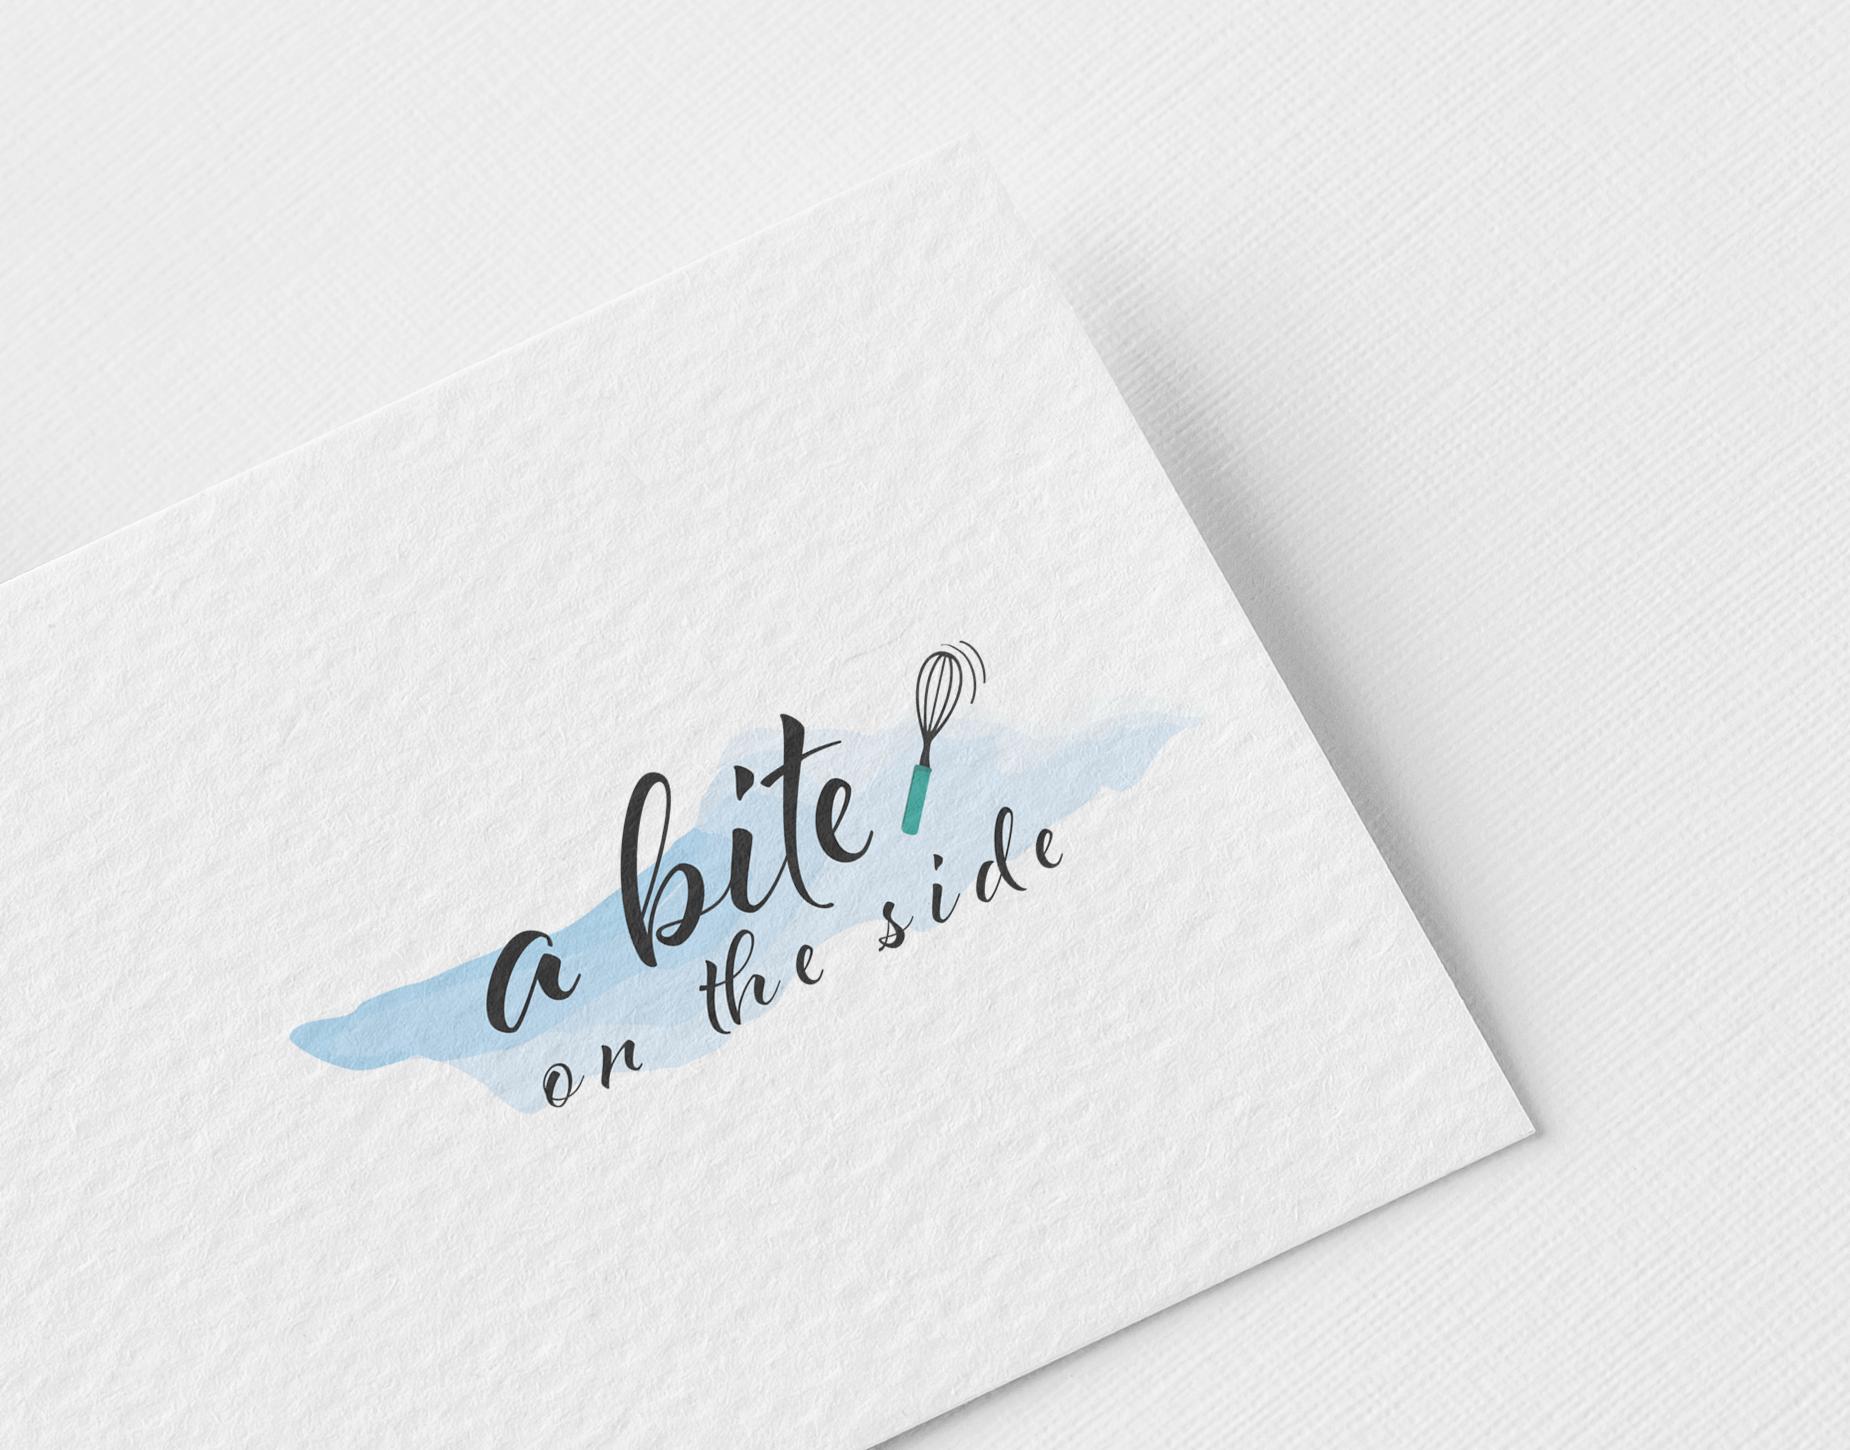 A food logo design and branding design printed on a business card design